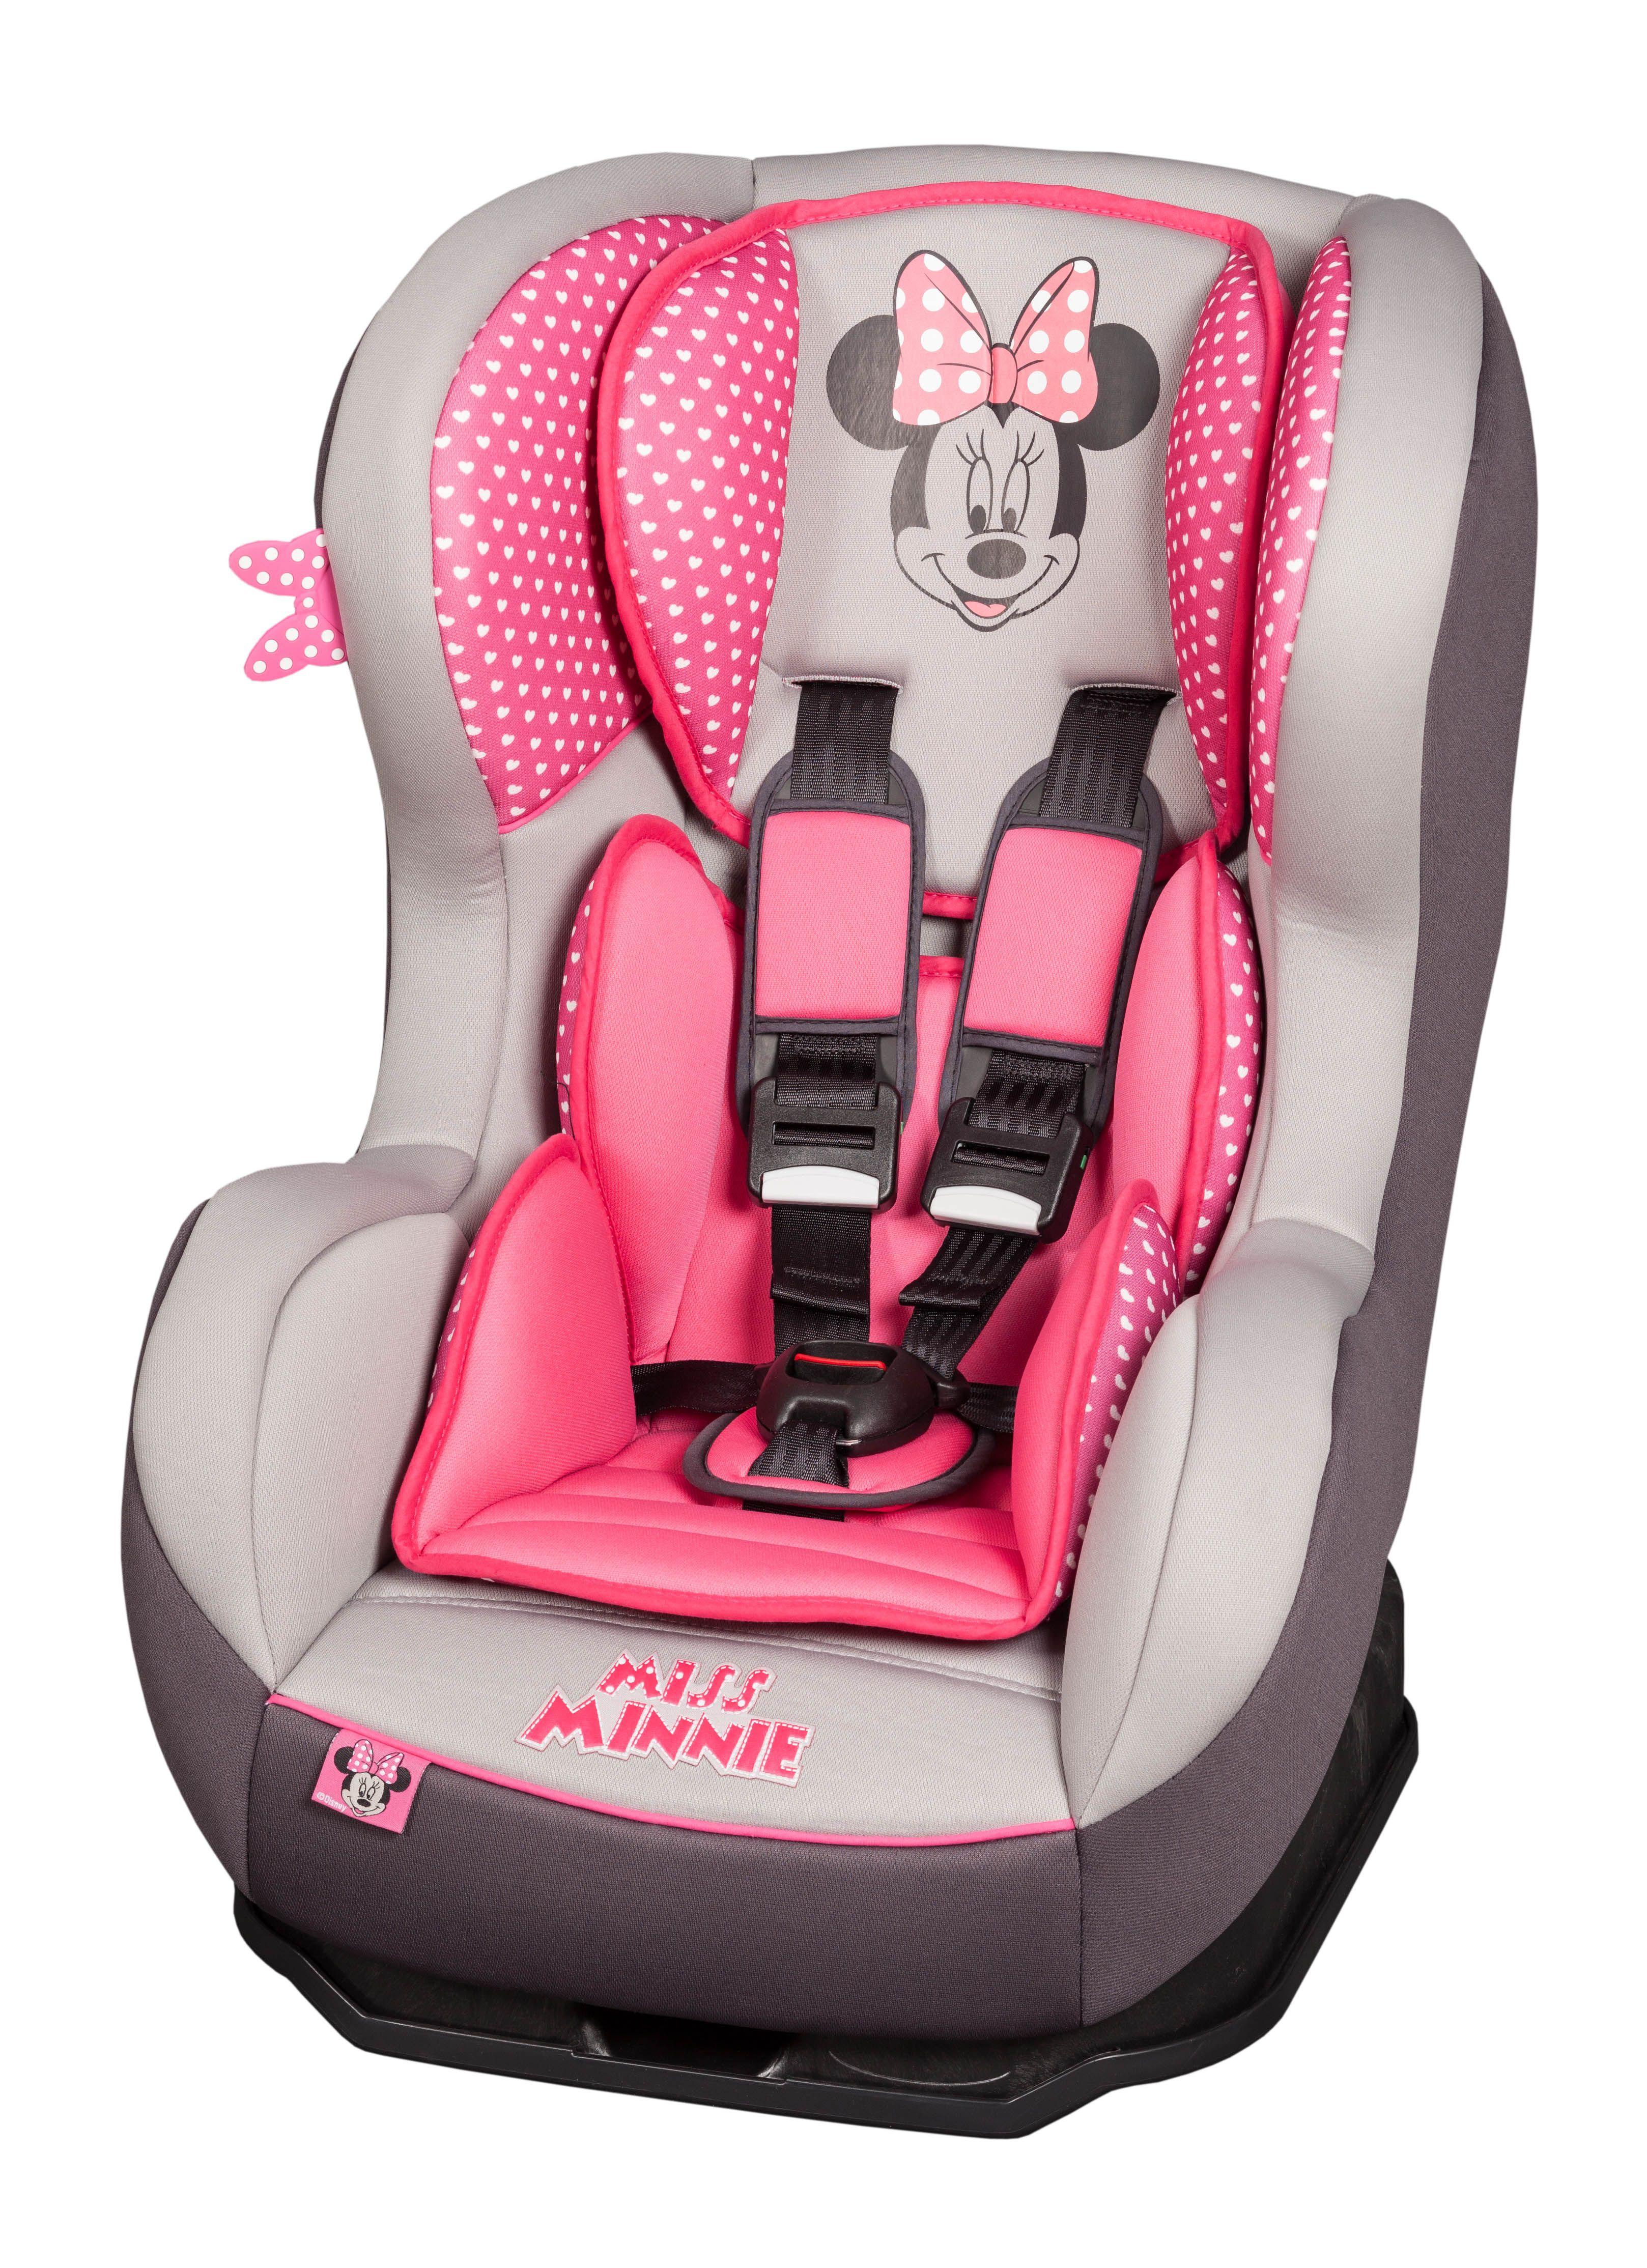 37+ Car seat stroller toys r us ideas in 2021